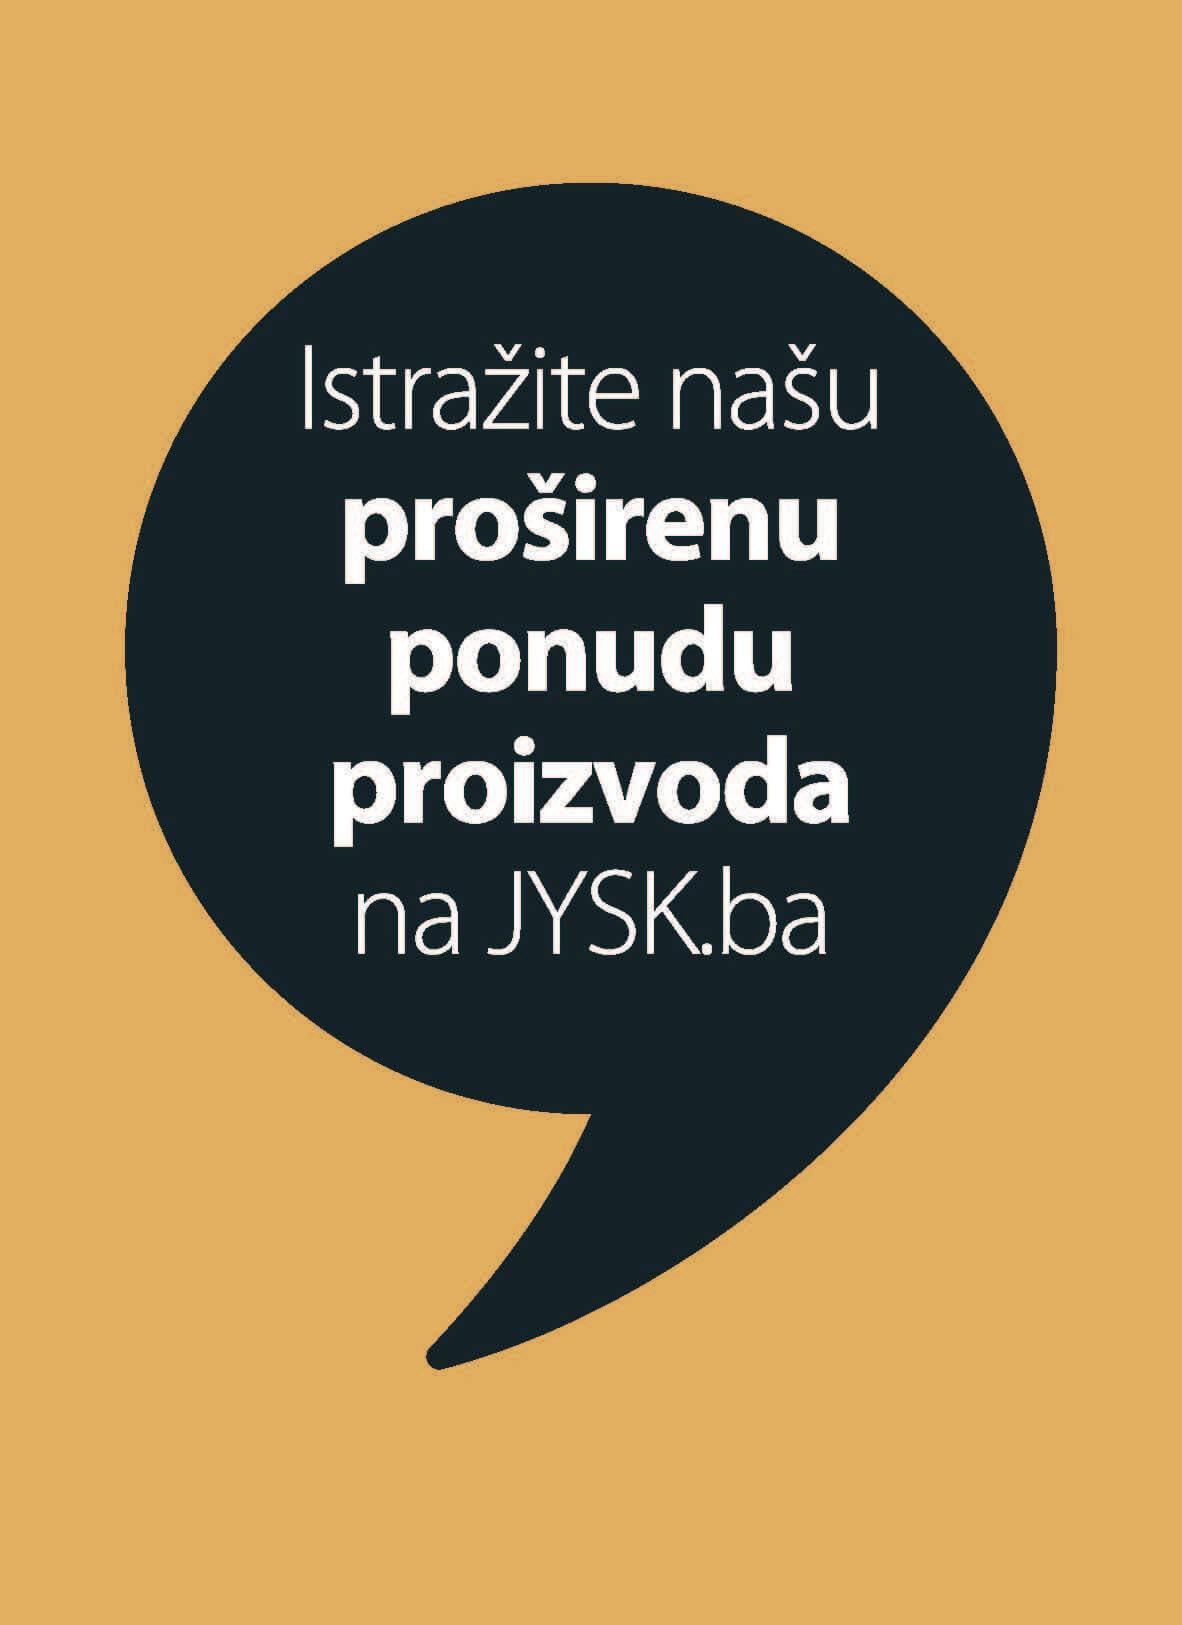 JYSK Akcijska ponuda MAJ JUN 2021 27.05.2021. 09.06.2021. eKatalozi.com PR Page 01